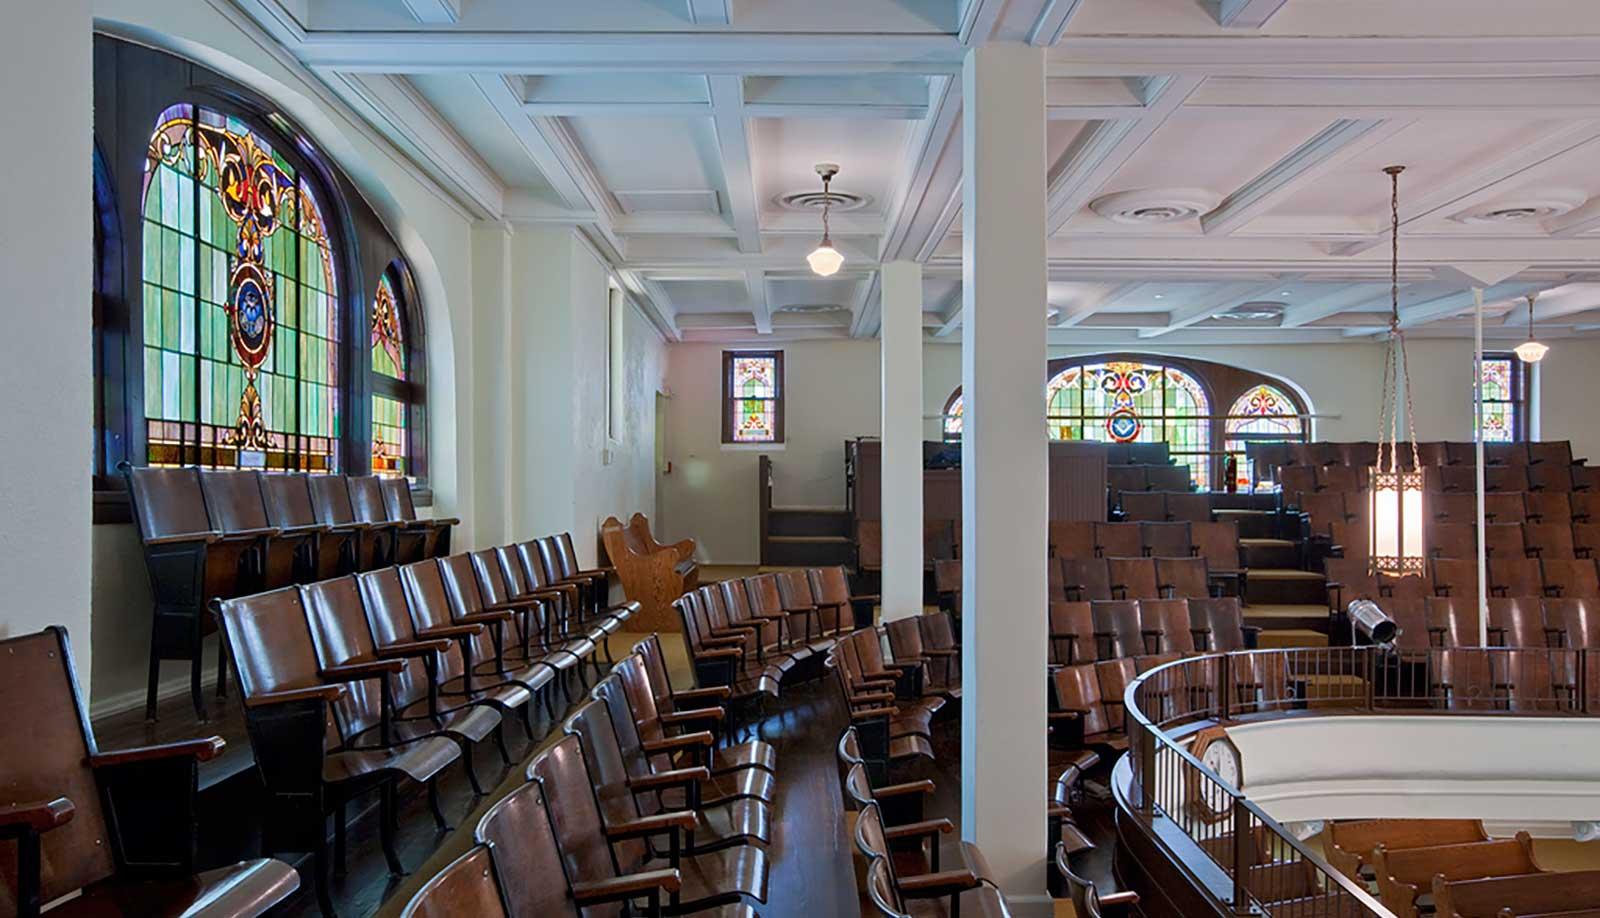 Dallas Arts District St. Paul United Methodist Interior